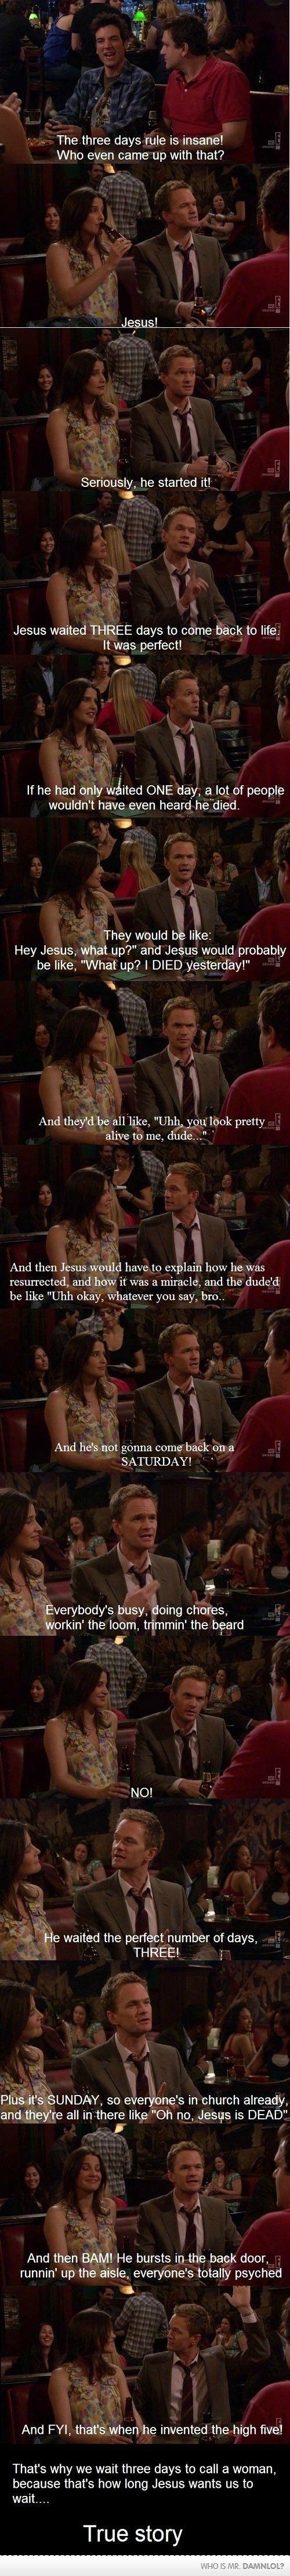 Hahaha Barney = the best theologian